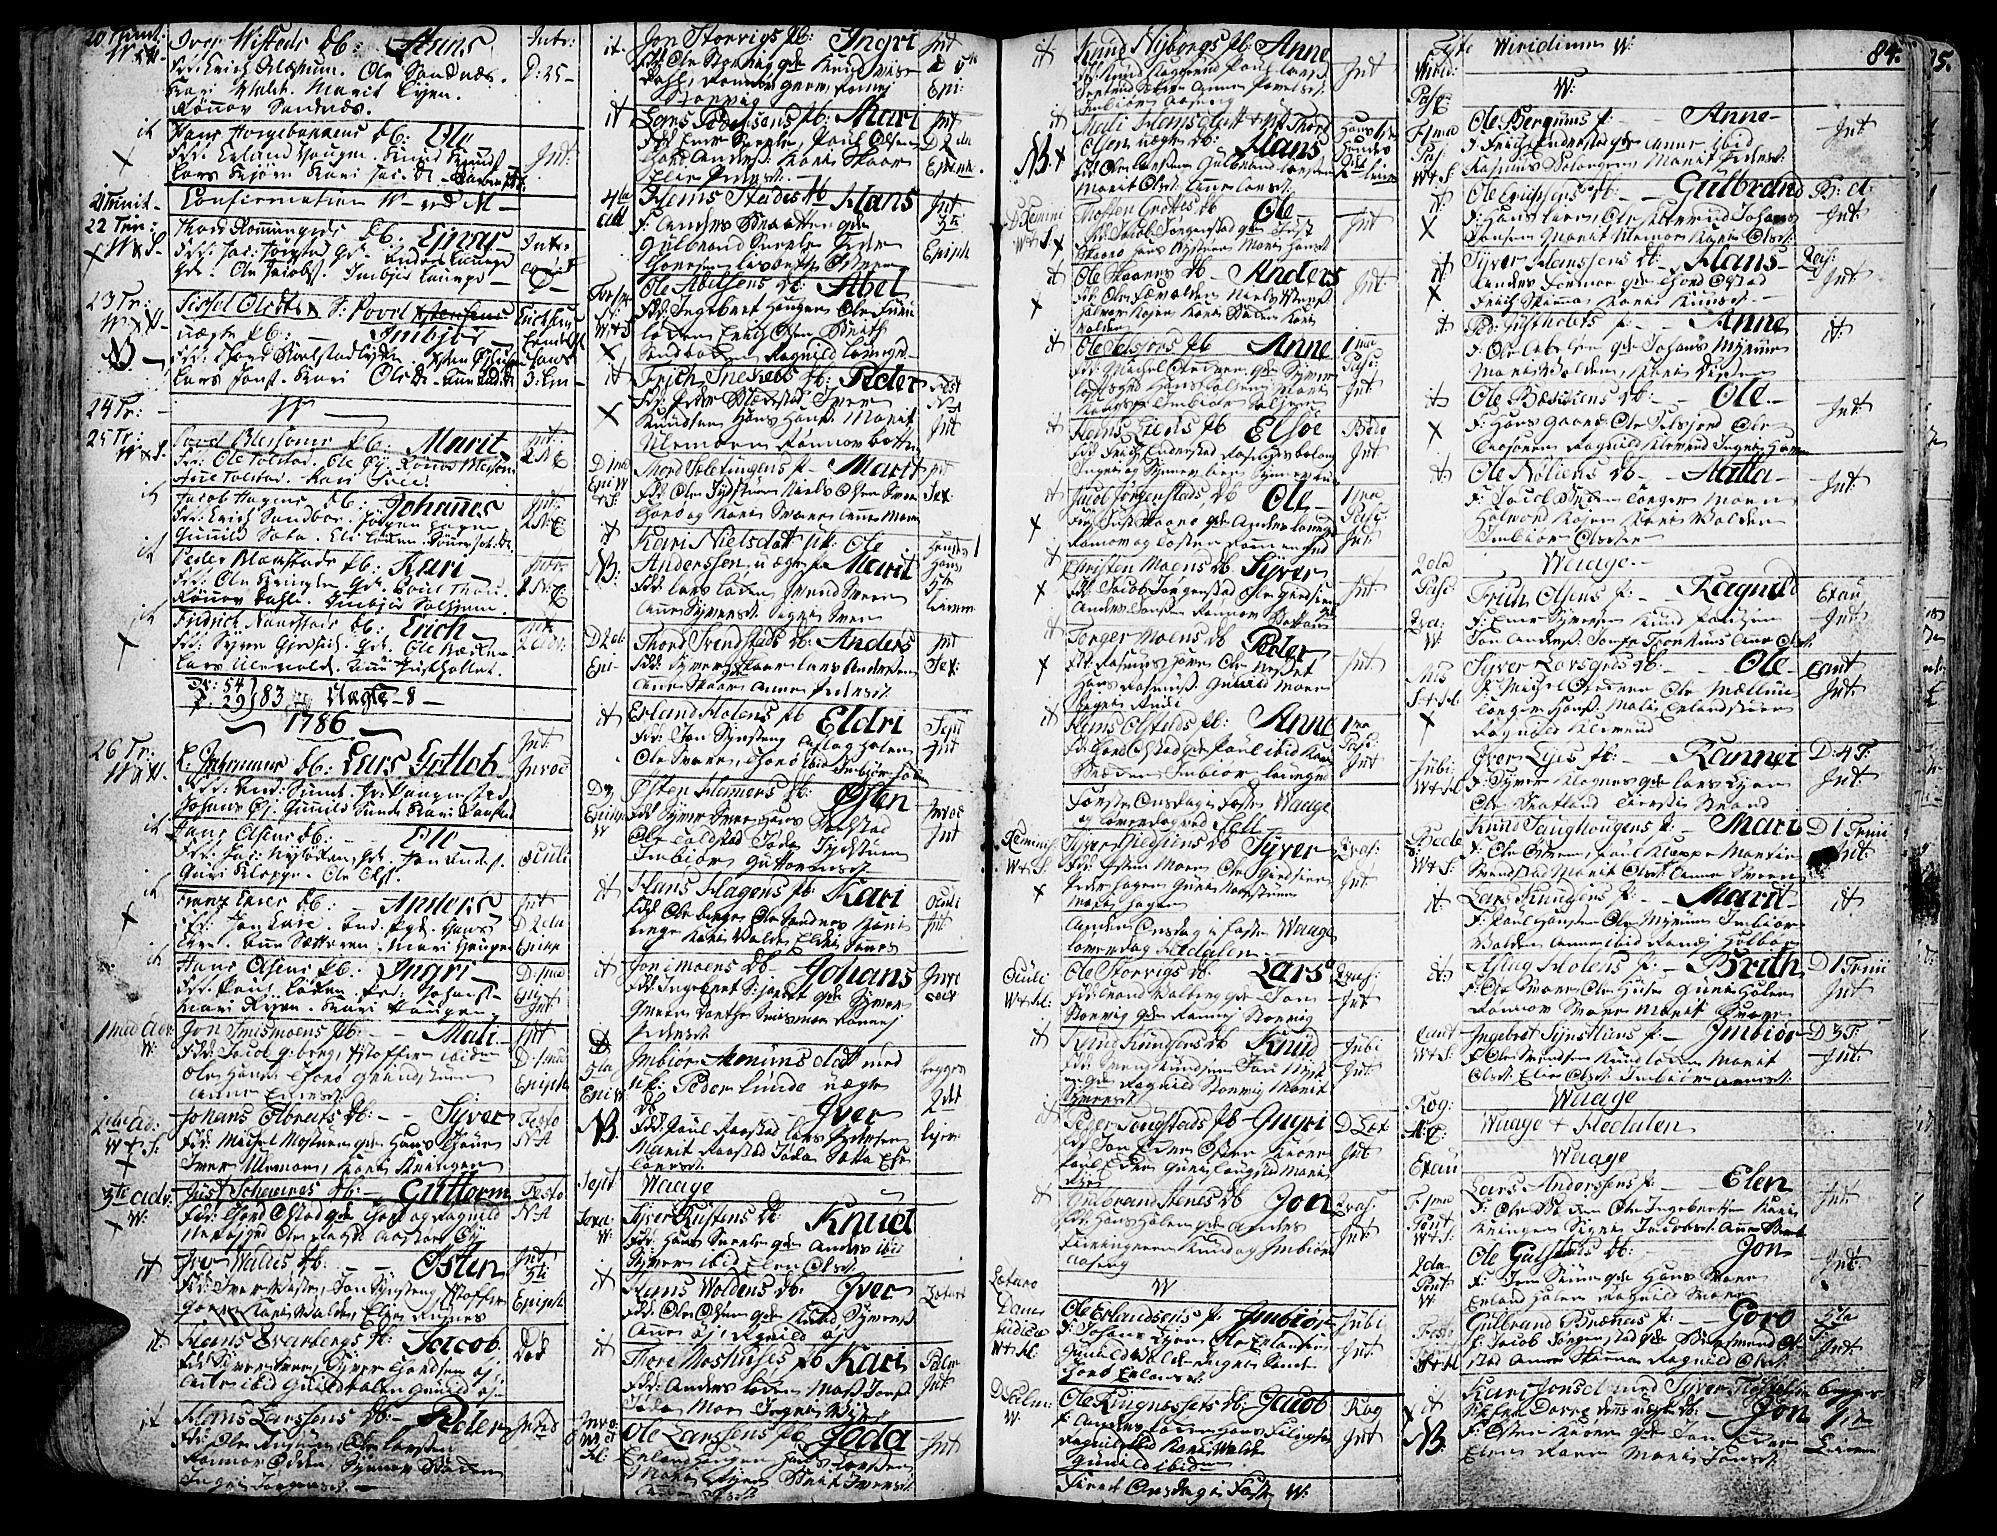 SAH, Vågå prestekontor, Ministerialbok nr. 1, 1739-1810, s. 84